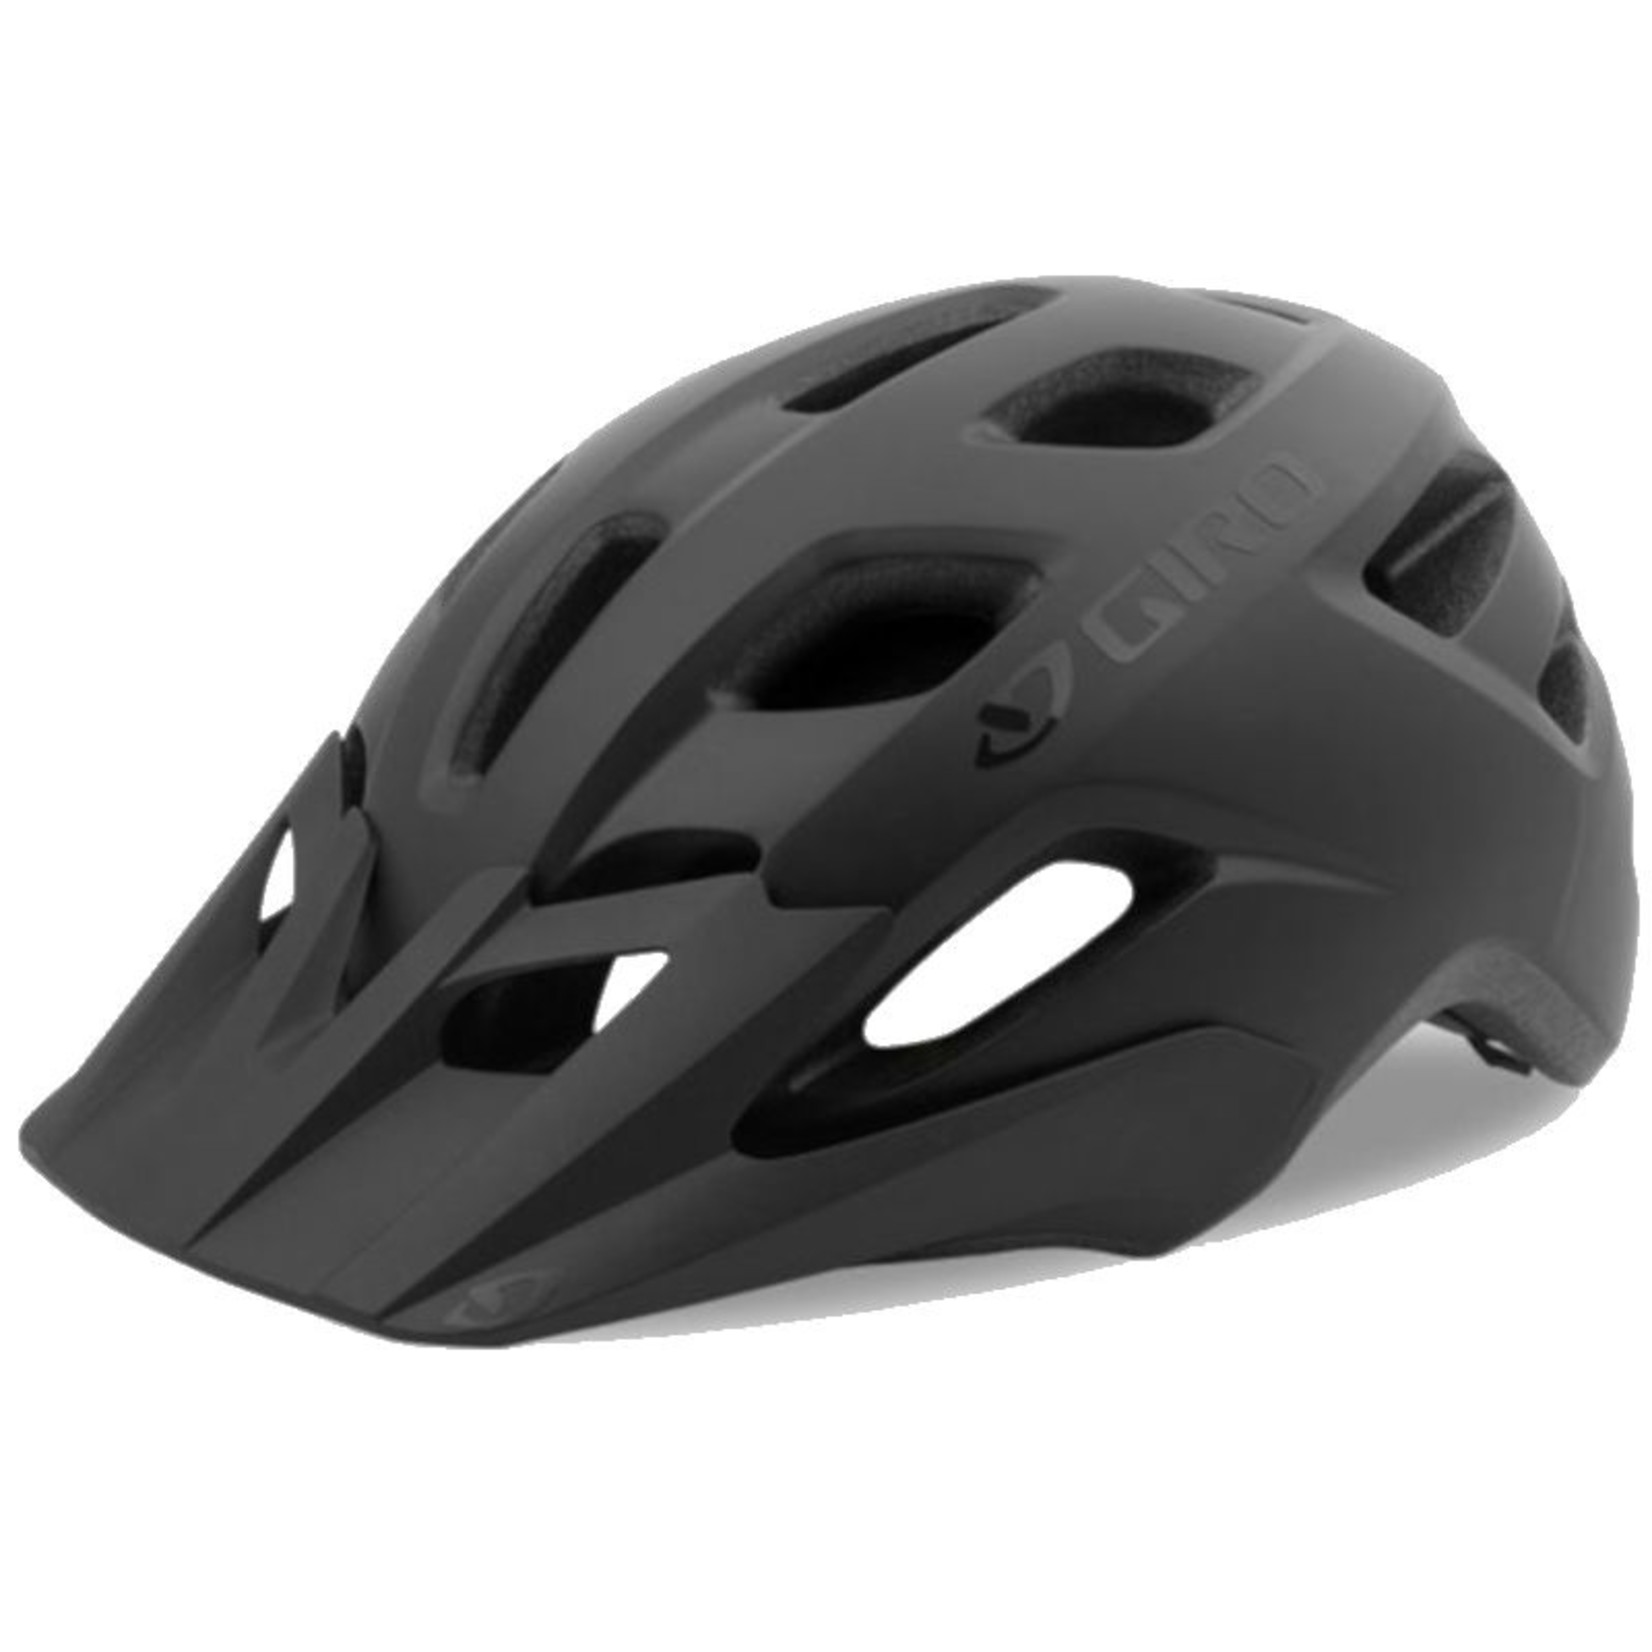 Giro Giro, Helmet Fixture 54-61cm